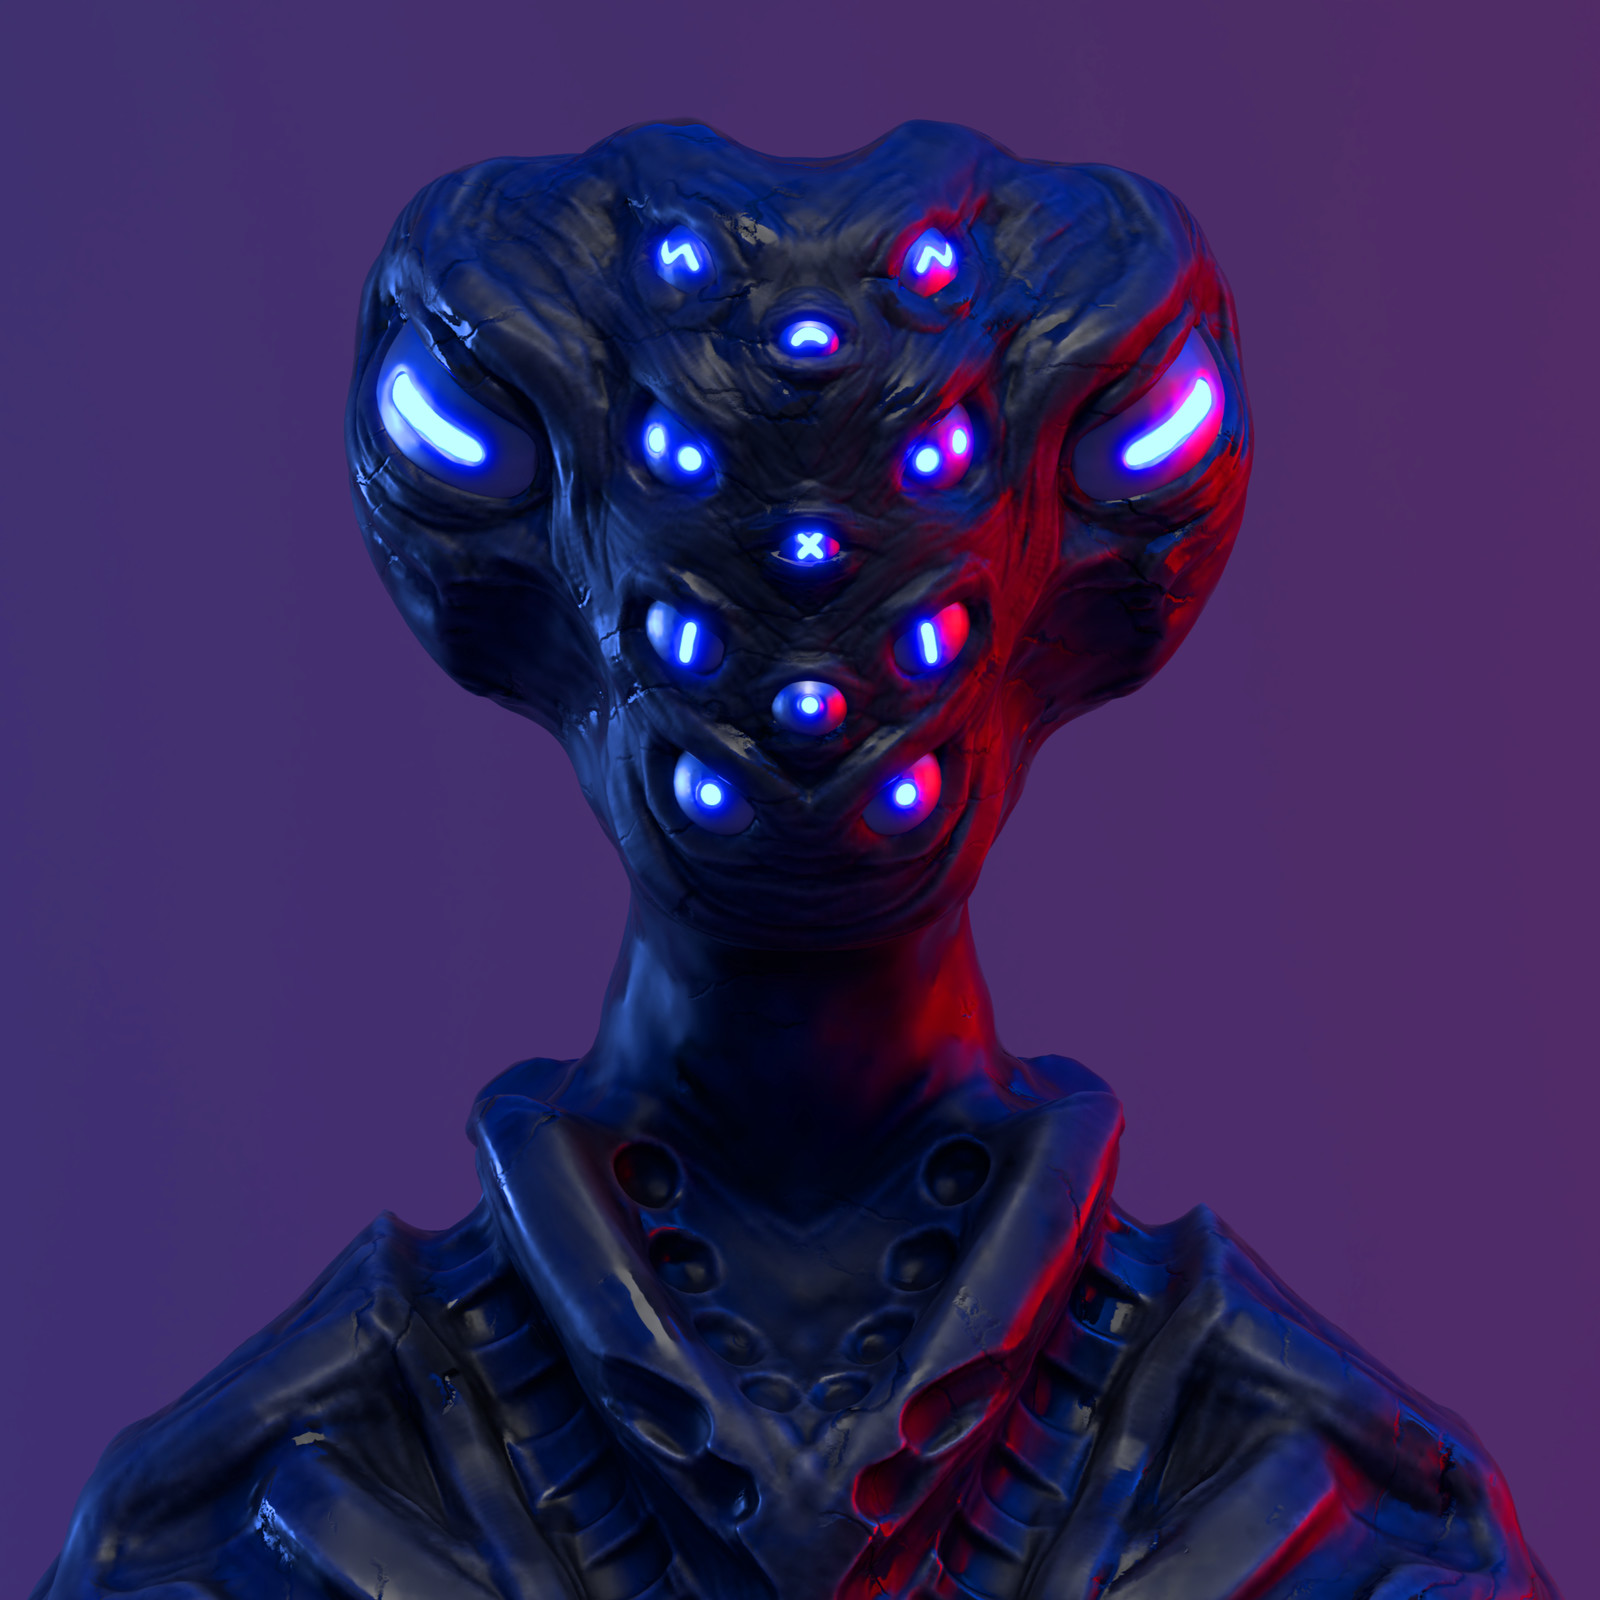 Sculpt January 2018 - Day 7: Eyes